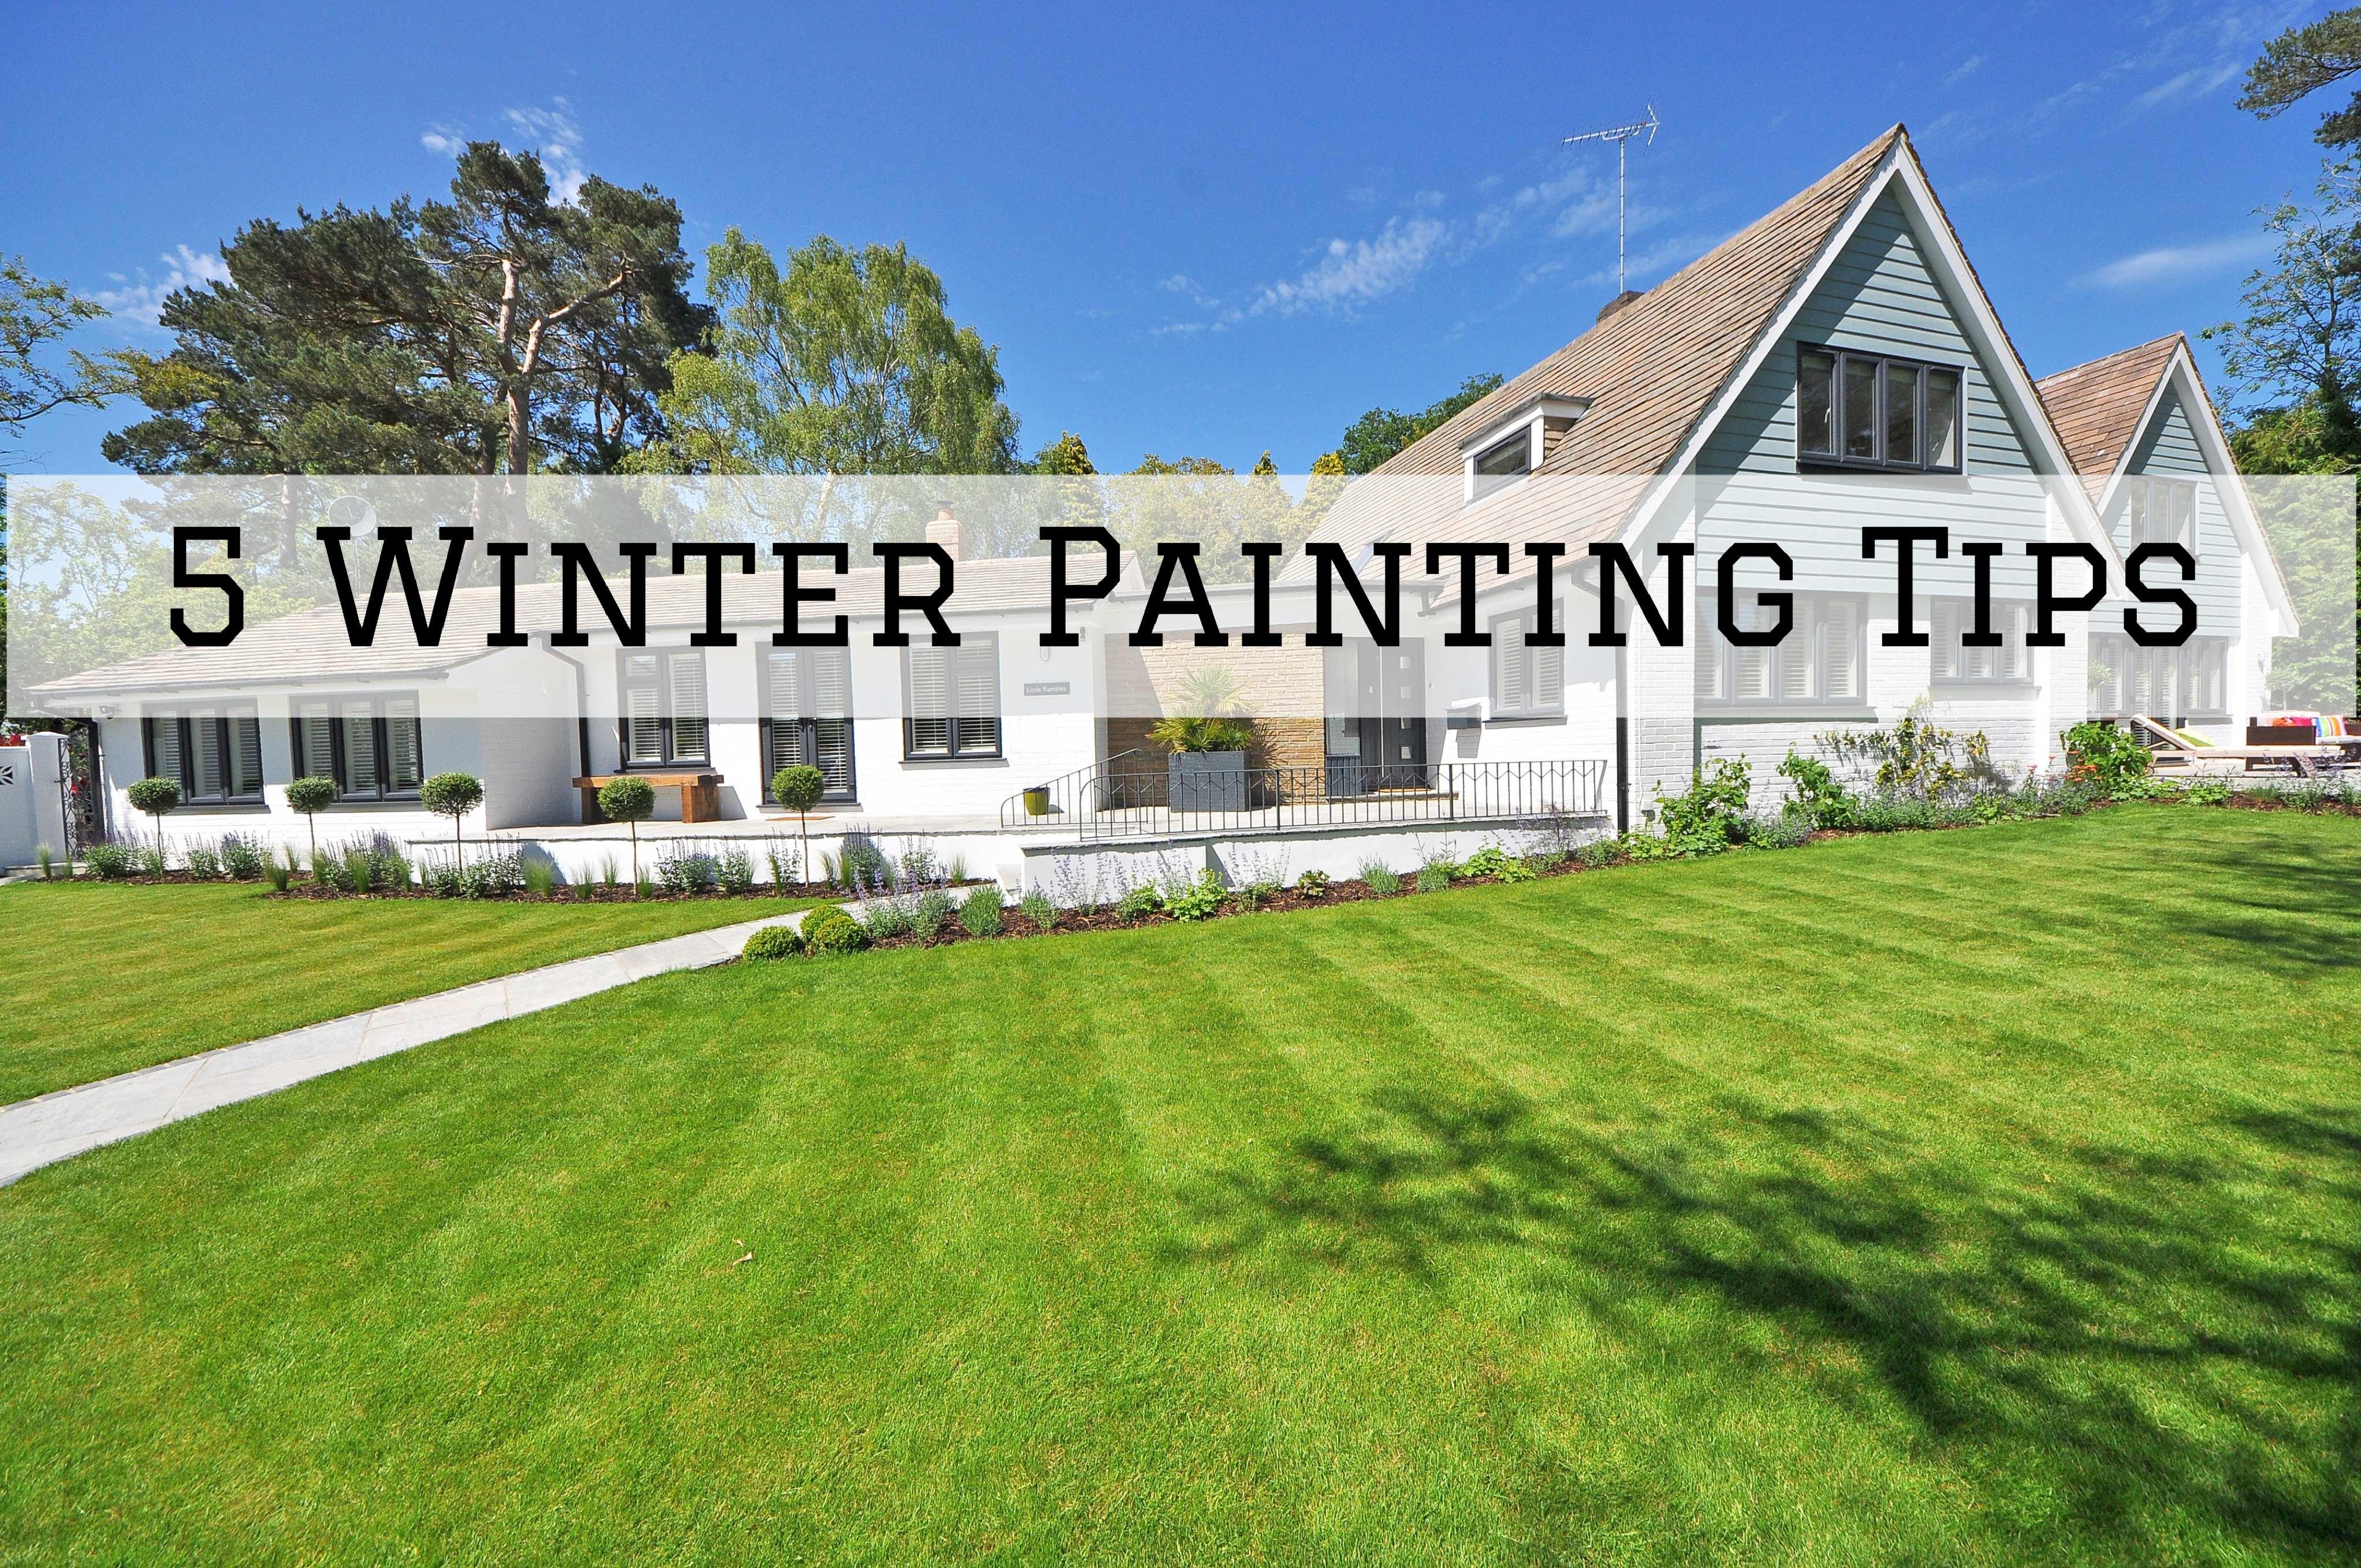 2021-08-16 Selah Painting St Louis MO Winter Painting Tips